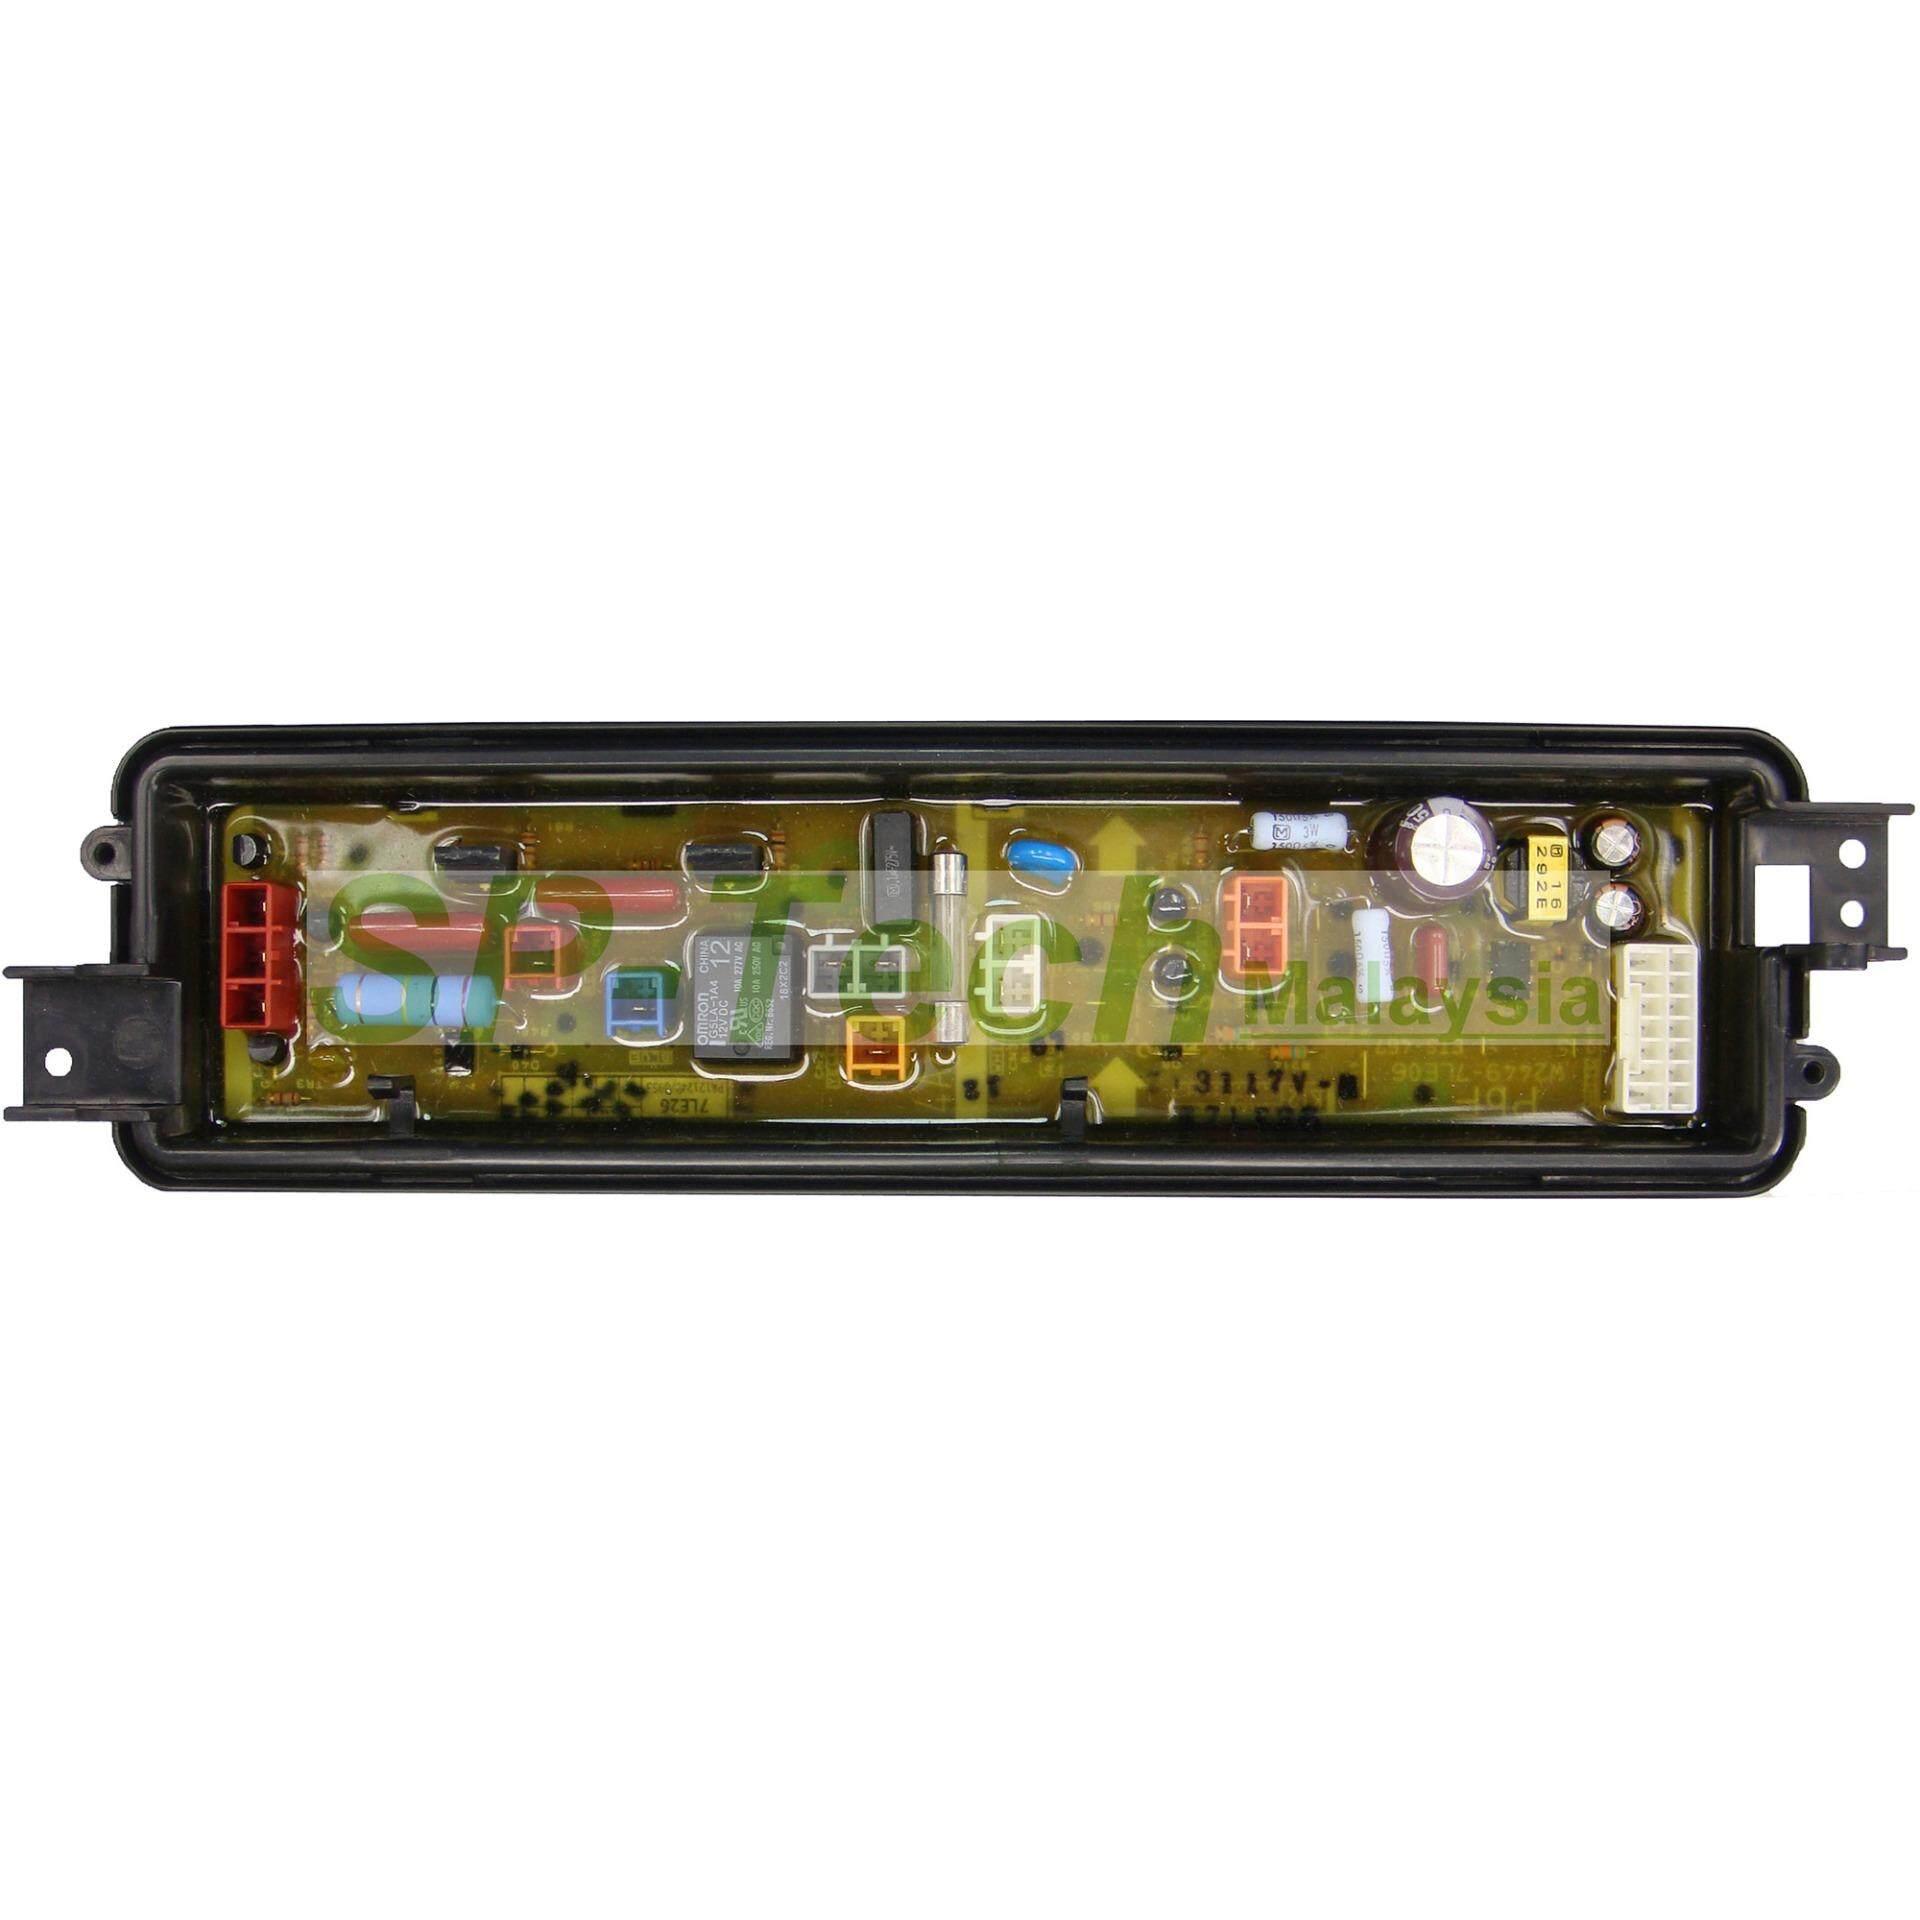 [PRE ORDER] NA-F80H2 PANASONIC WASHING MACHINE POWER PCB BOARD-ORIGINAL